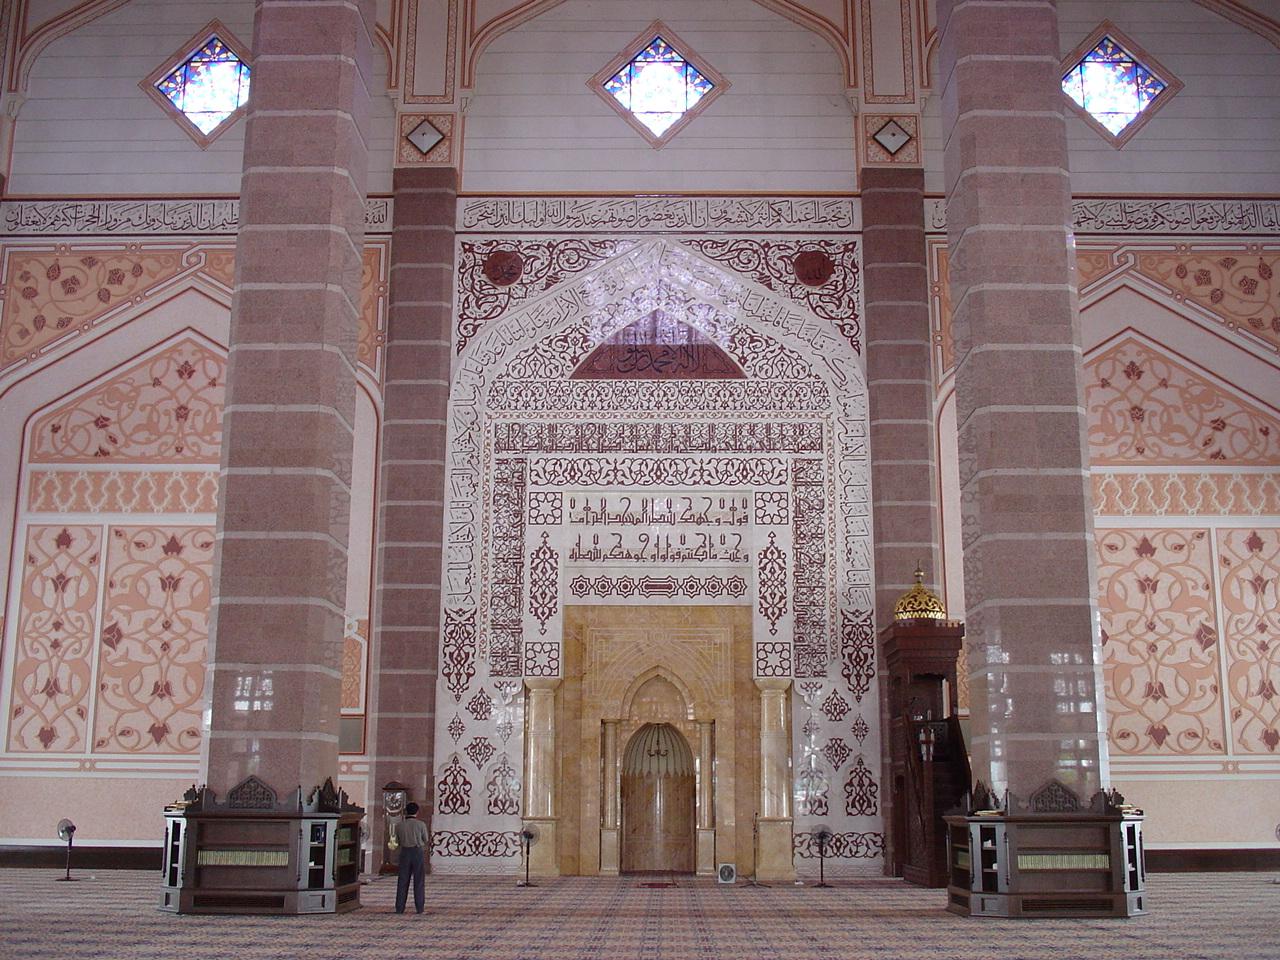 Mosque Putra in Putrajaya, Malaysia